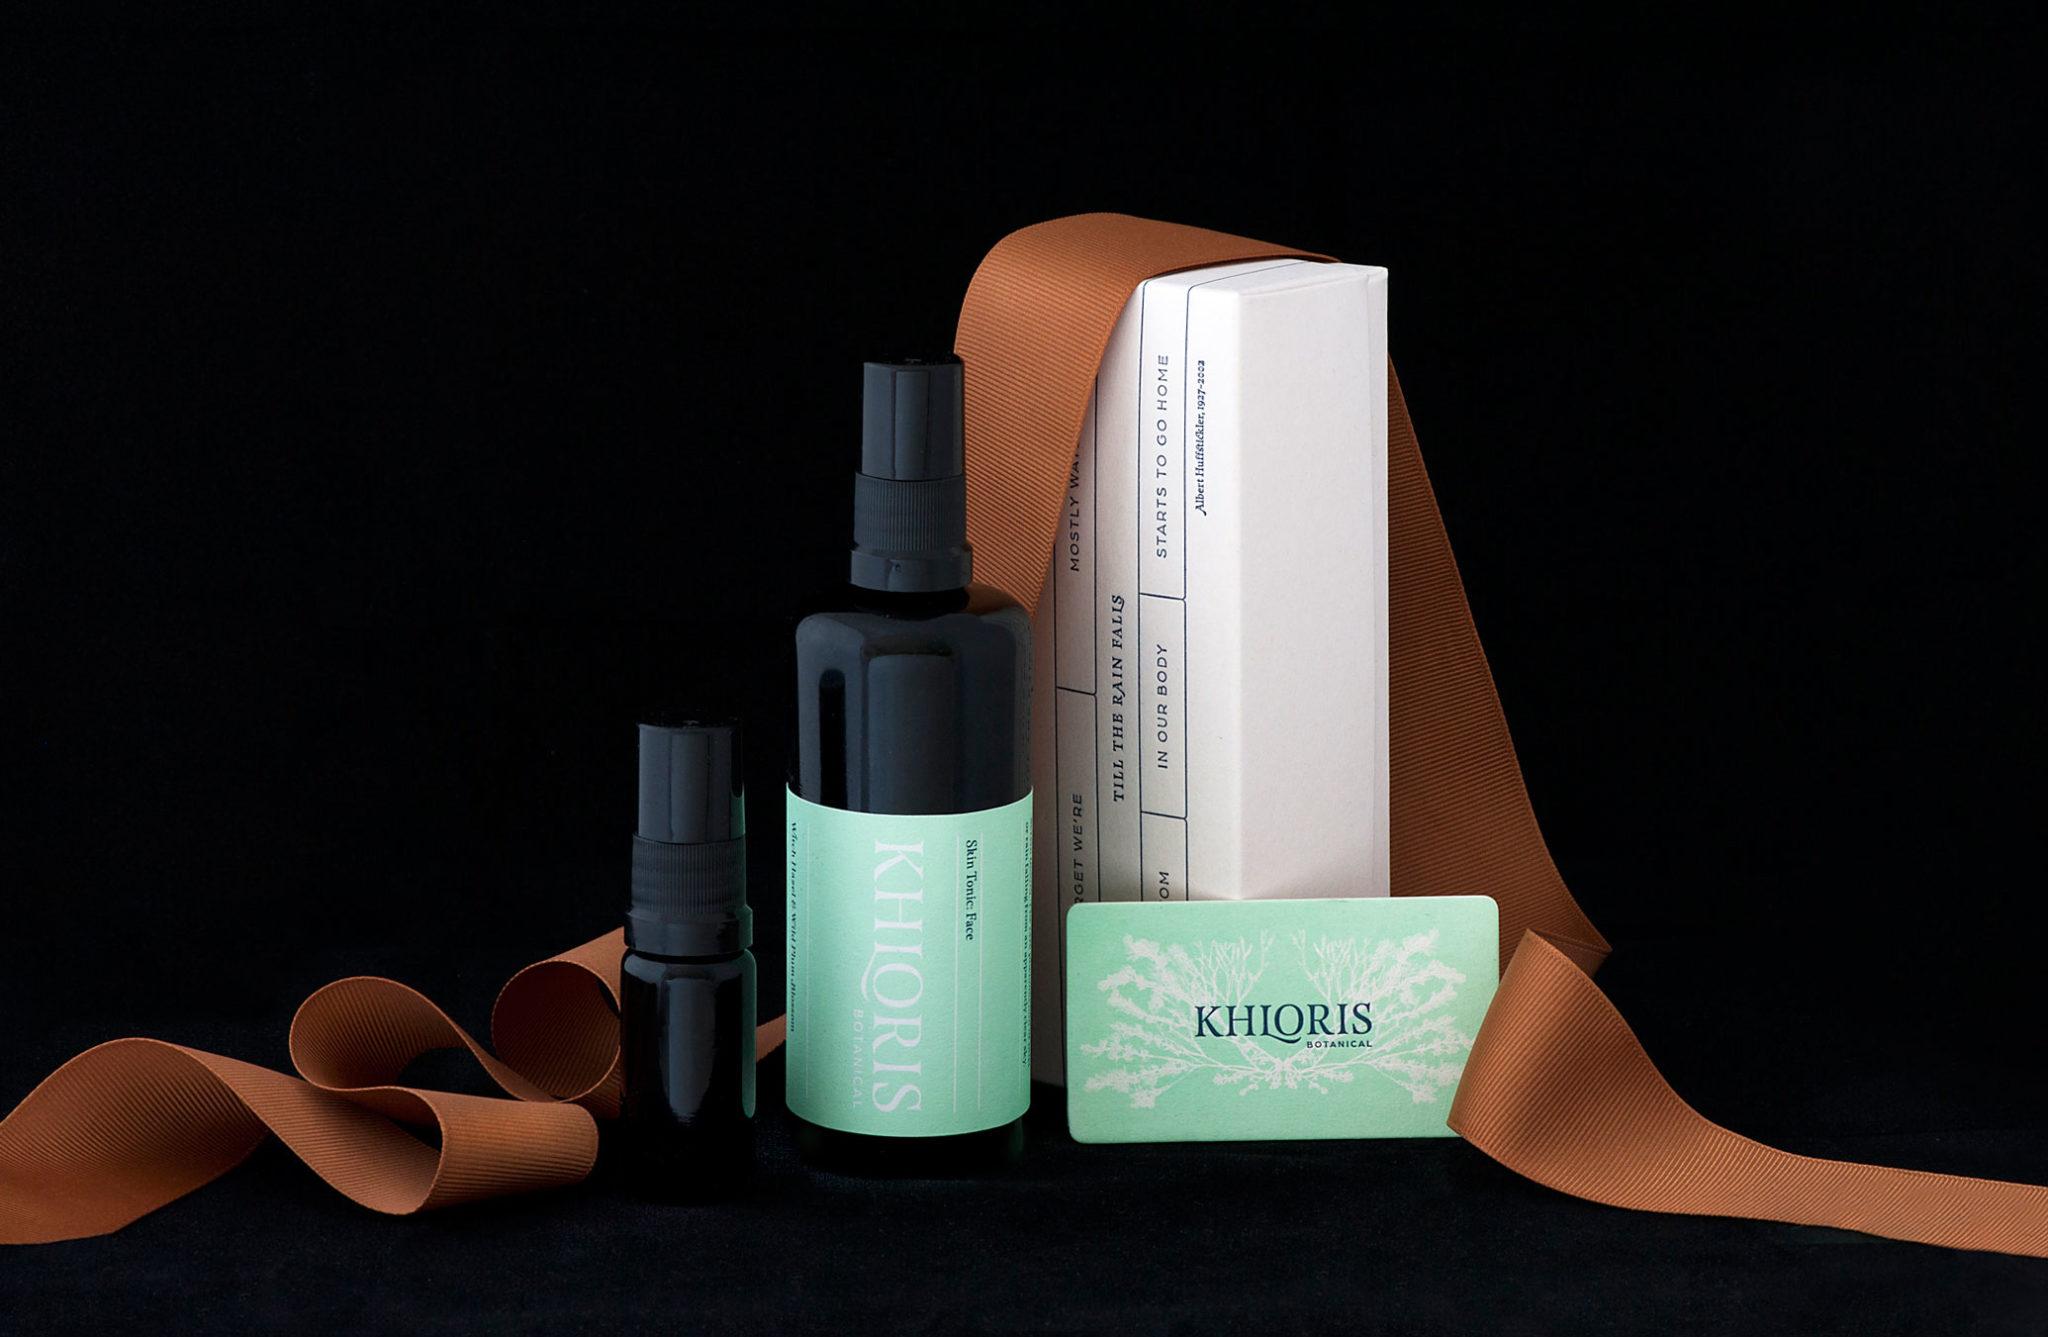 khloris_20140806_5770_product1